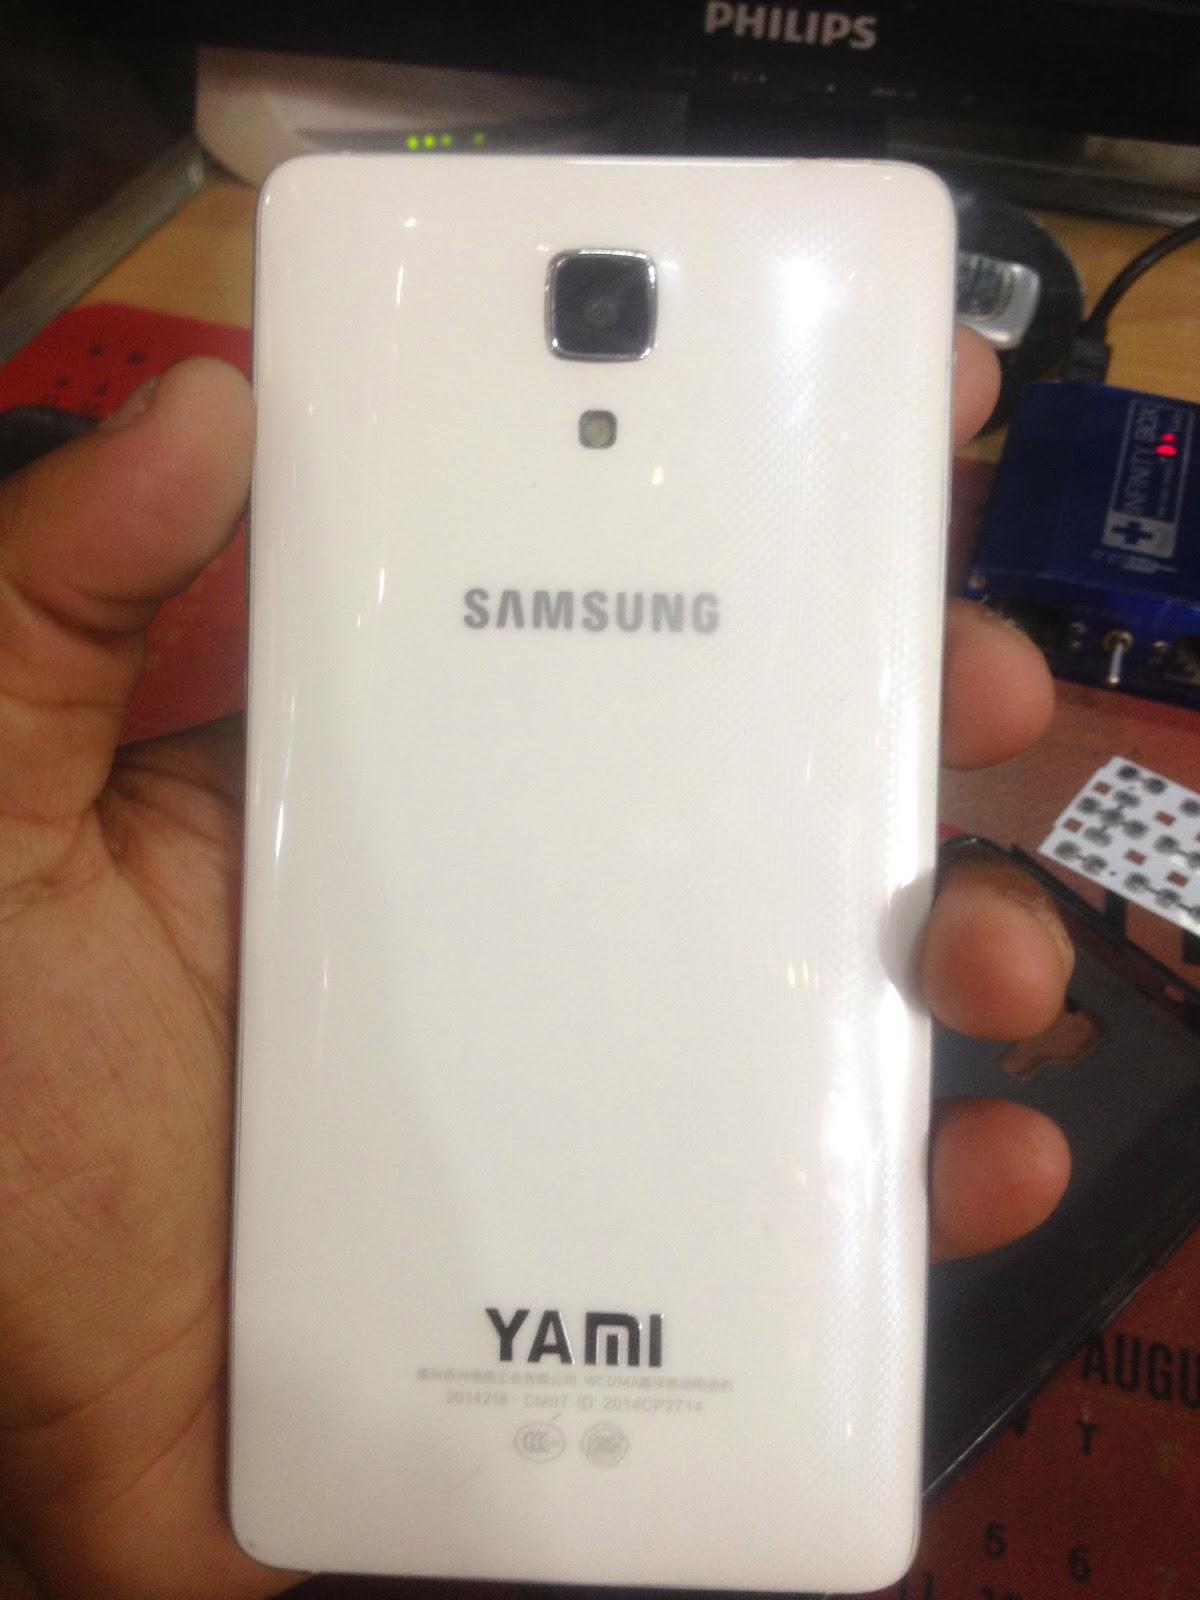 SAMSUNG YAMI M10 FLASH FILE MT6582 4 4 4 BY Mobile hospital